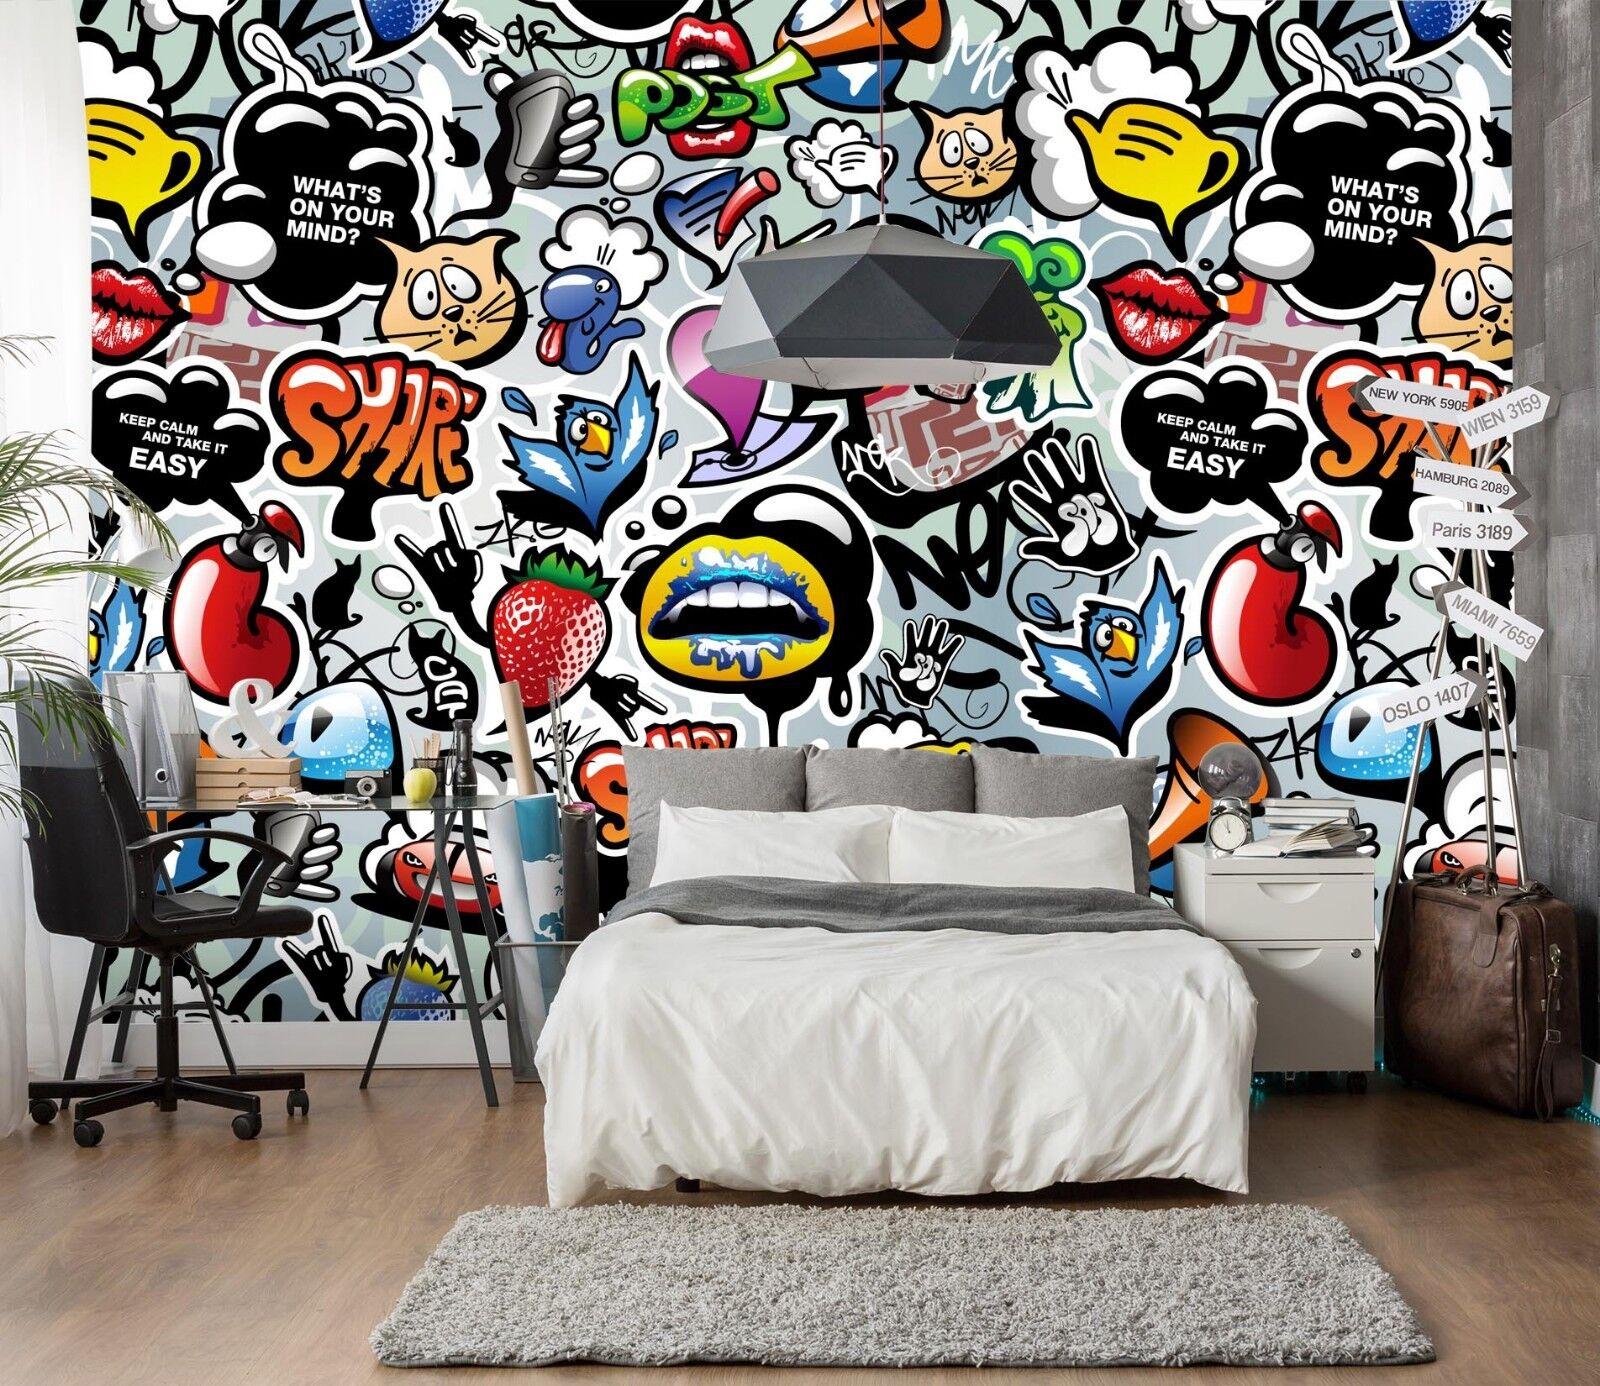 3D Fruit Graffiti 7111 Wallpaper Mural Paper Wall Print Indoor Murals CA Summer